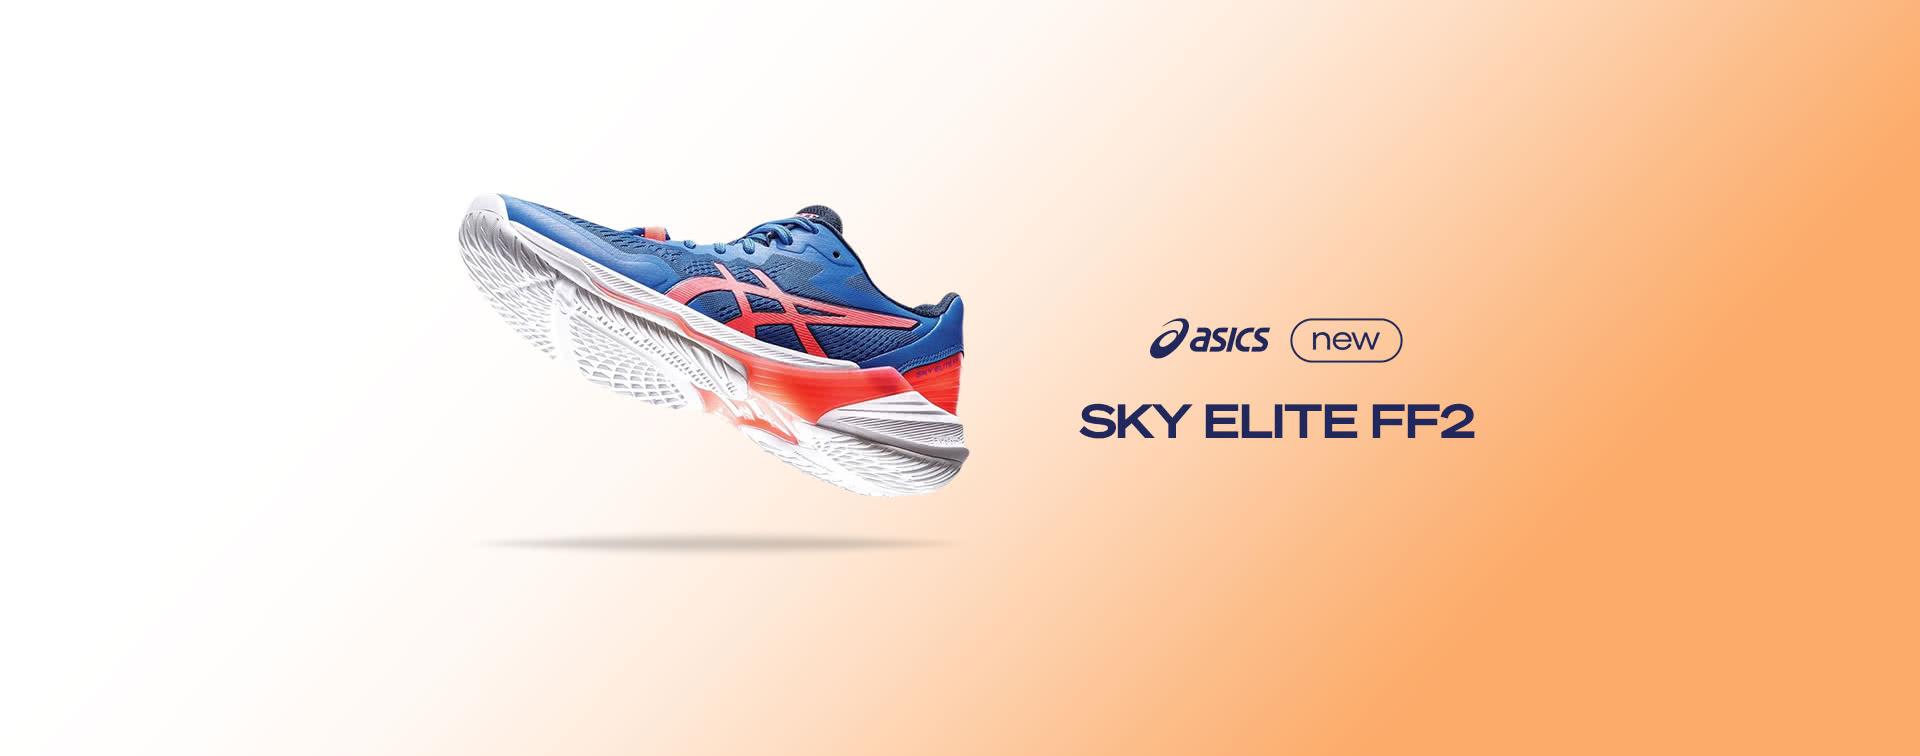 scarpe-pallavolo/asics/gel-sky-elite